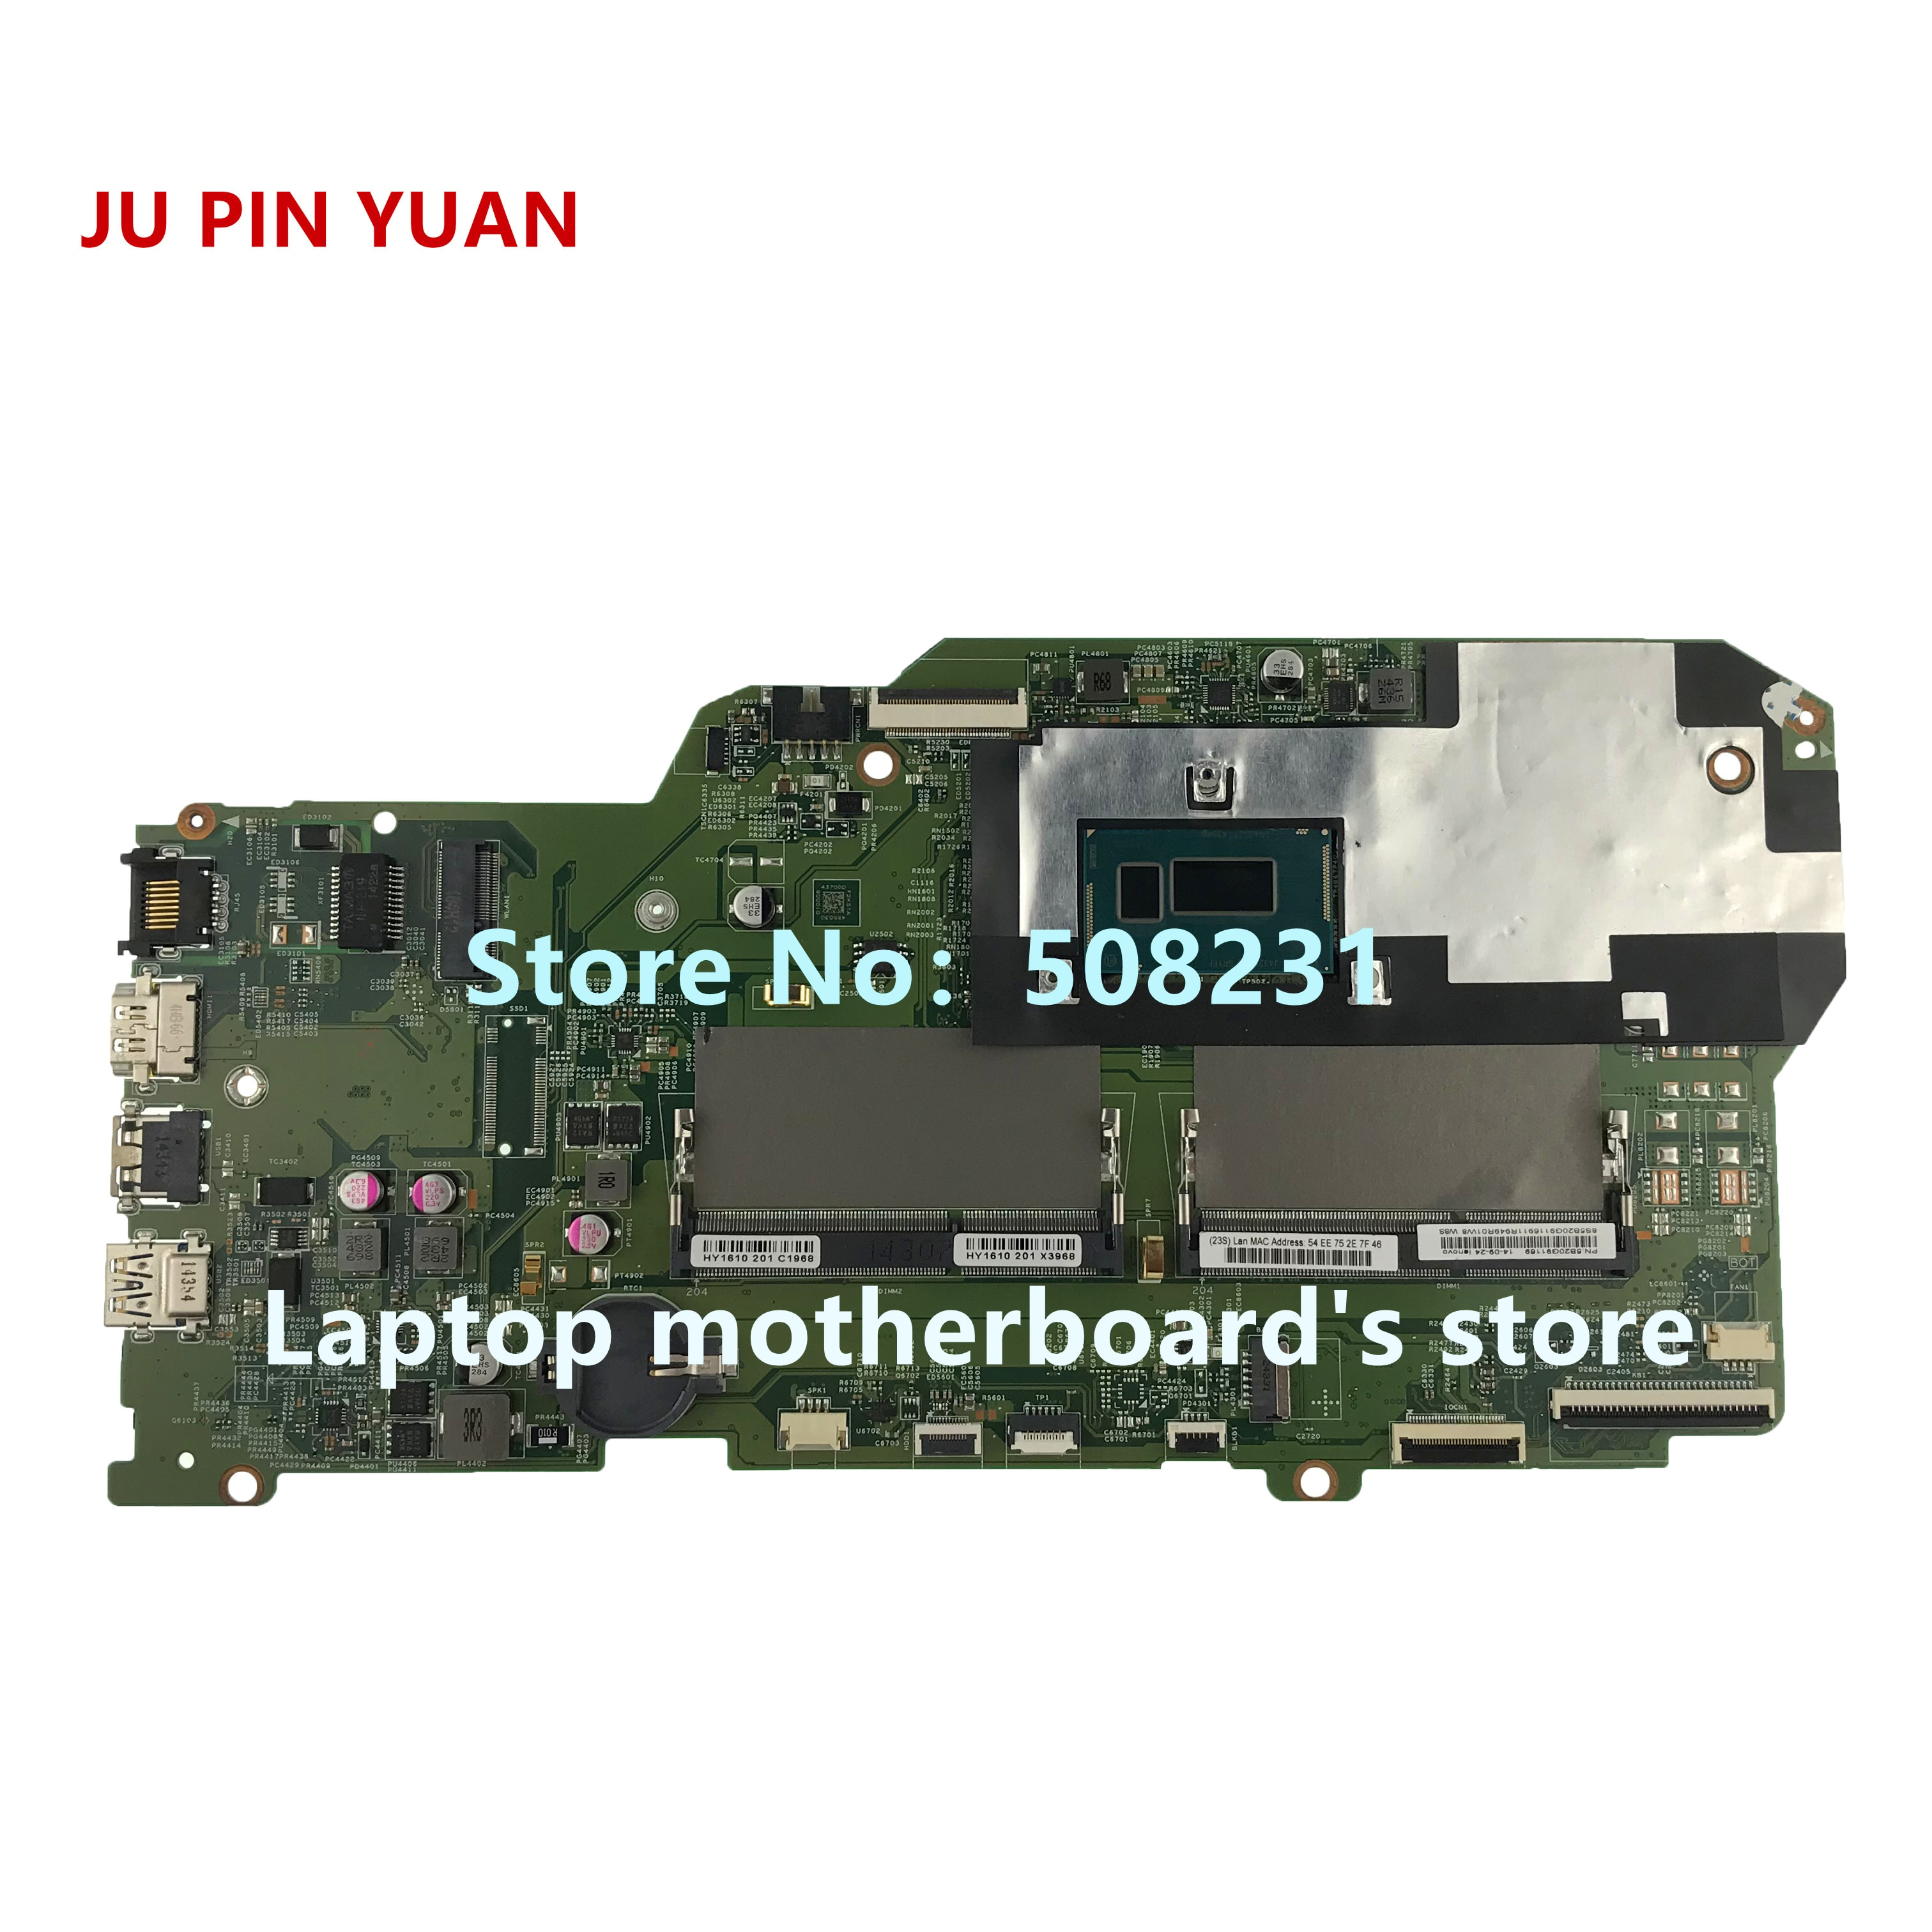 JU PIN YUAN 448.03G01.0011 5B20Q91169 материнская плата для Lenovo Flex 2 Pro Edge 15 материнская плата для ноутбука со стандартным процессором полностью протестирована